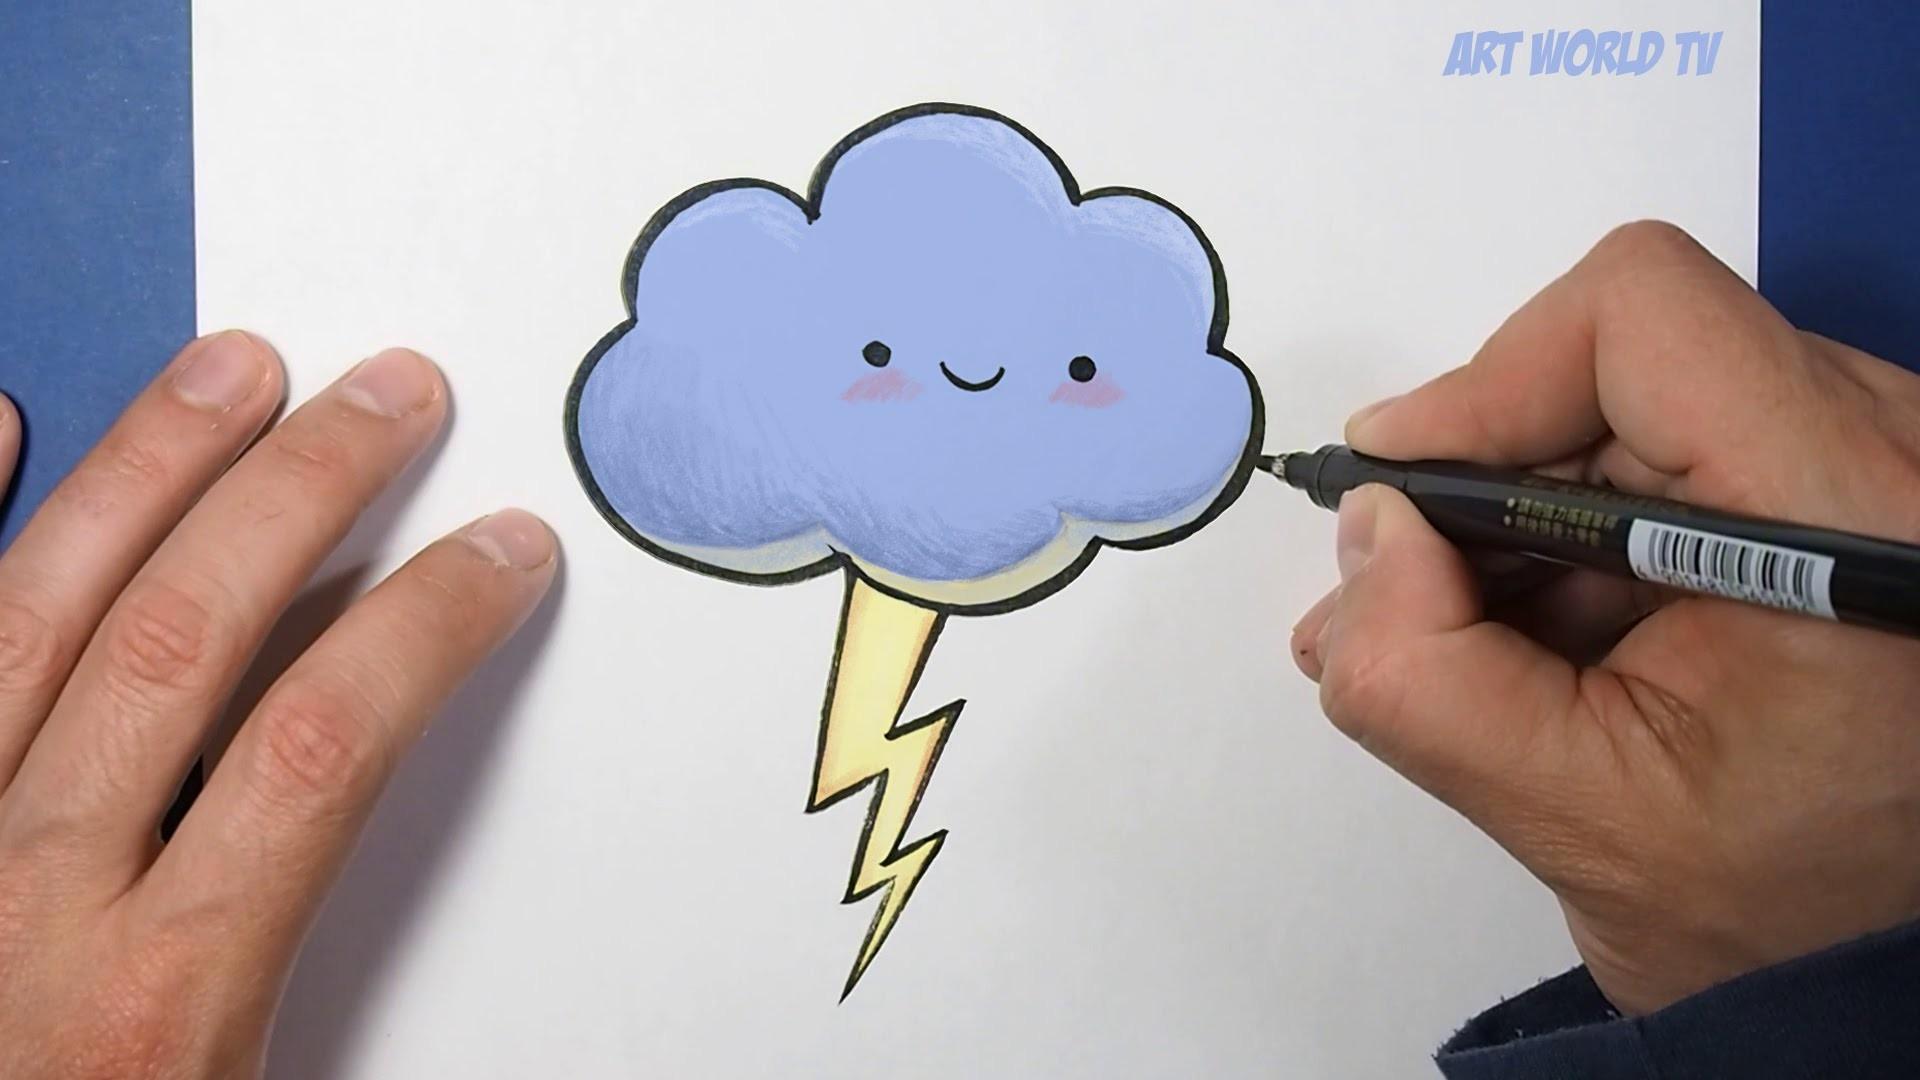 How to Draw a Cloud | Como Dibujar una Nube | Dibujos Kawaii Drawings